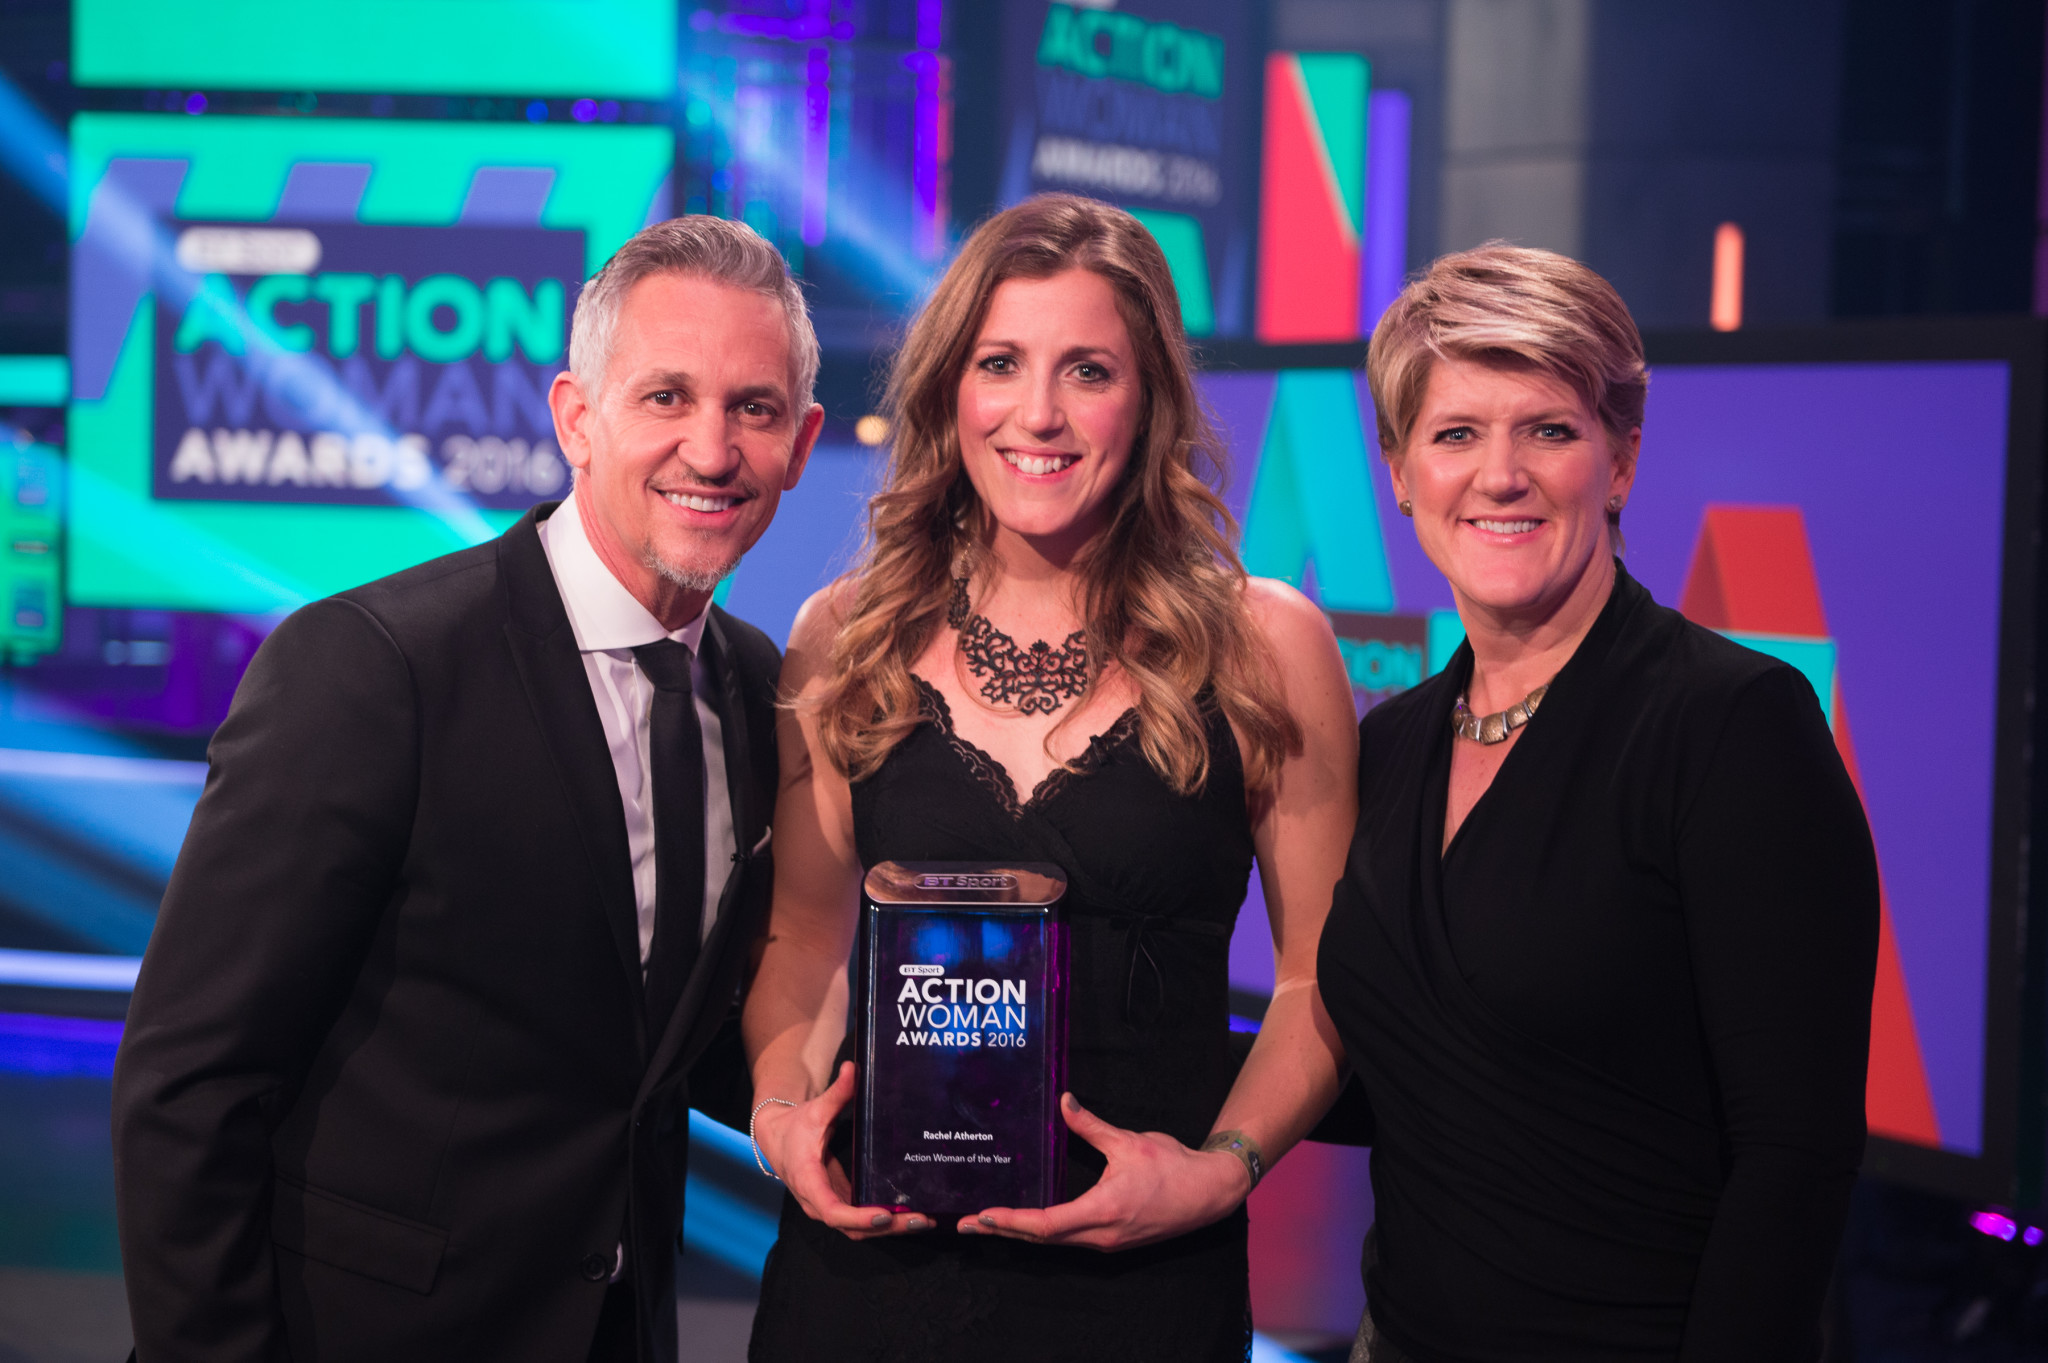 'BT Sport Woman of the Year Awards' (BT Sport) - Edit Producer